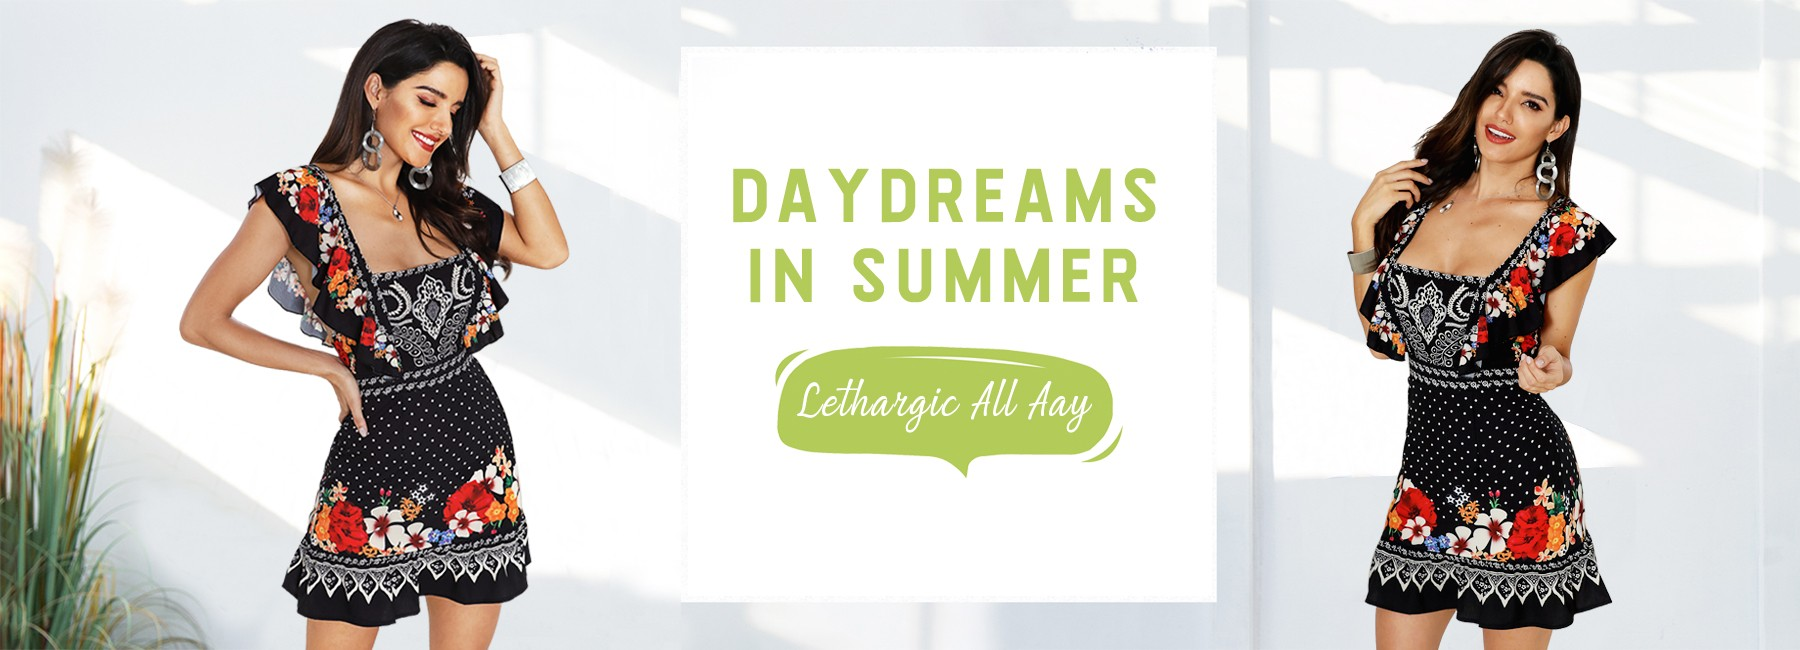 Daydreams In Summer